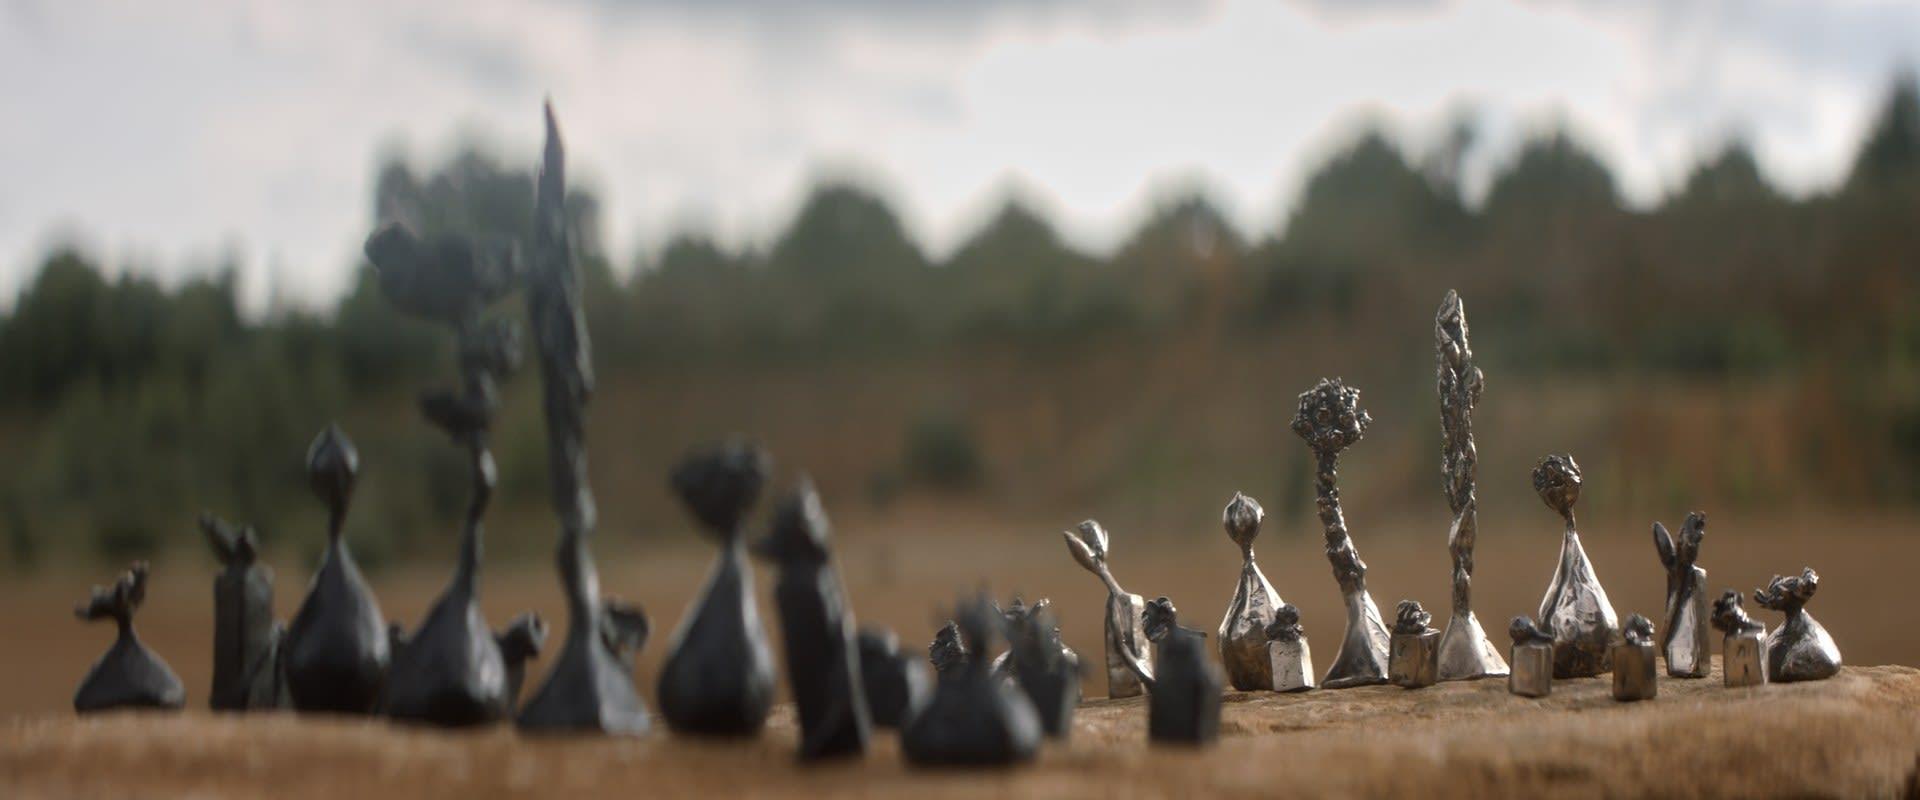 The bronze chess set.